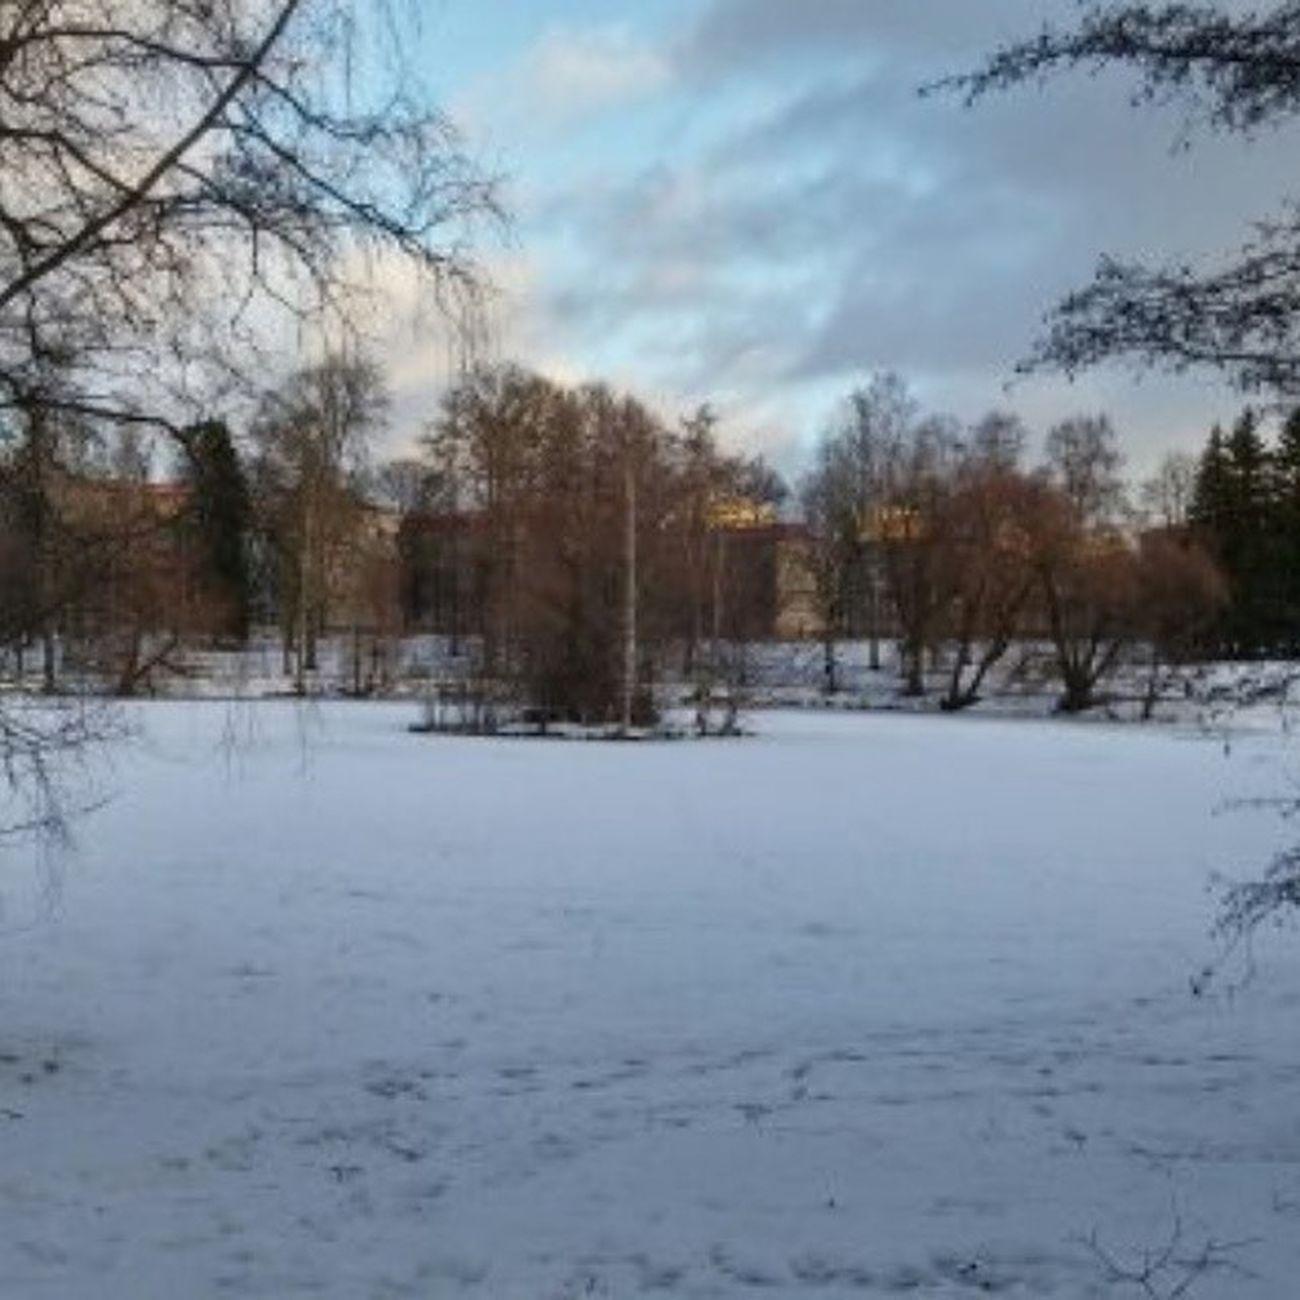 Sorsapuisto Tampere Finland Suomi Snow Lumi January Tammikuu Ilovetampere Ilovefinland Visittampere Tre Tampereallbright